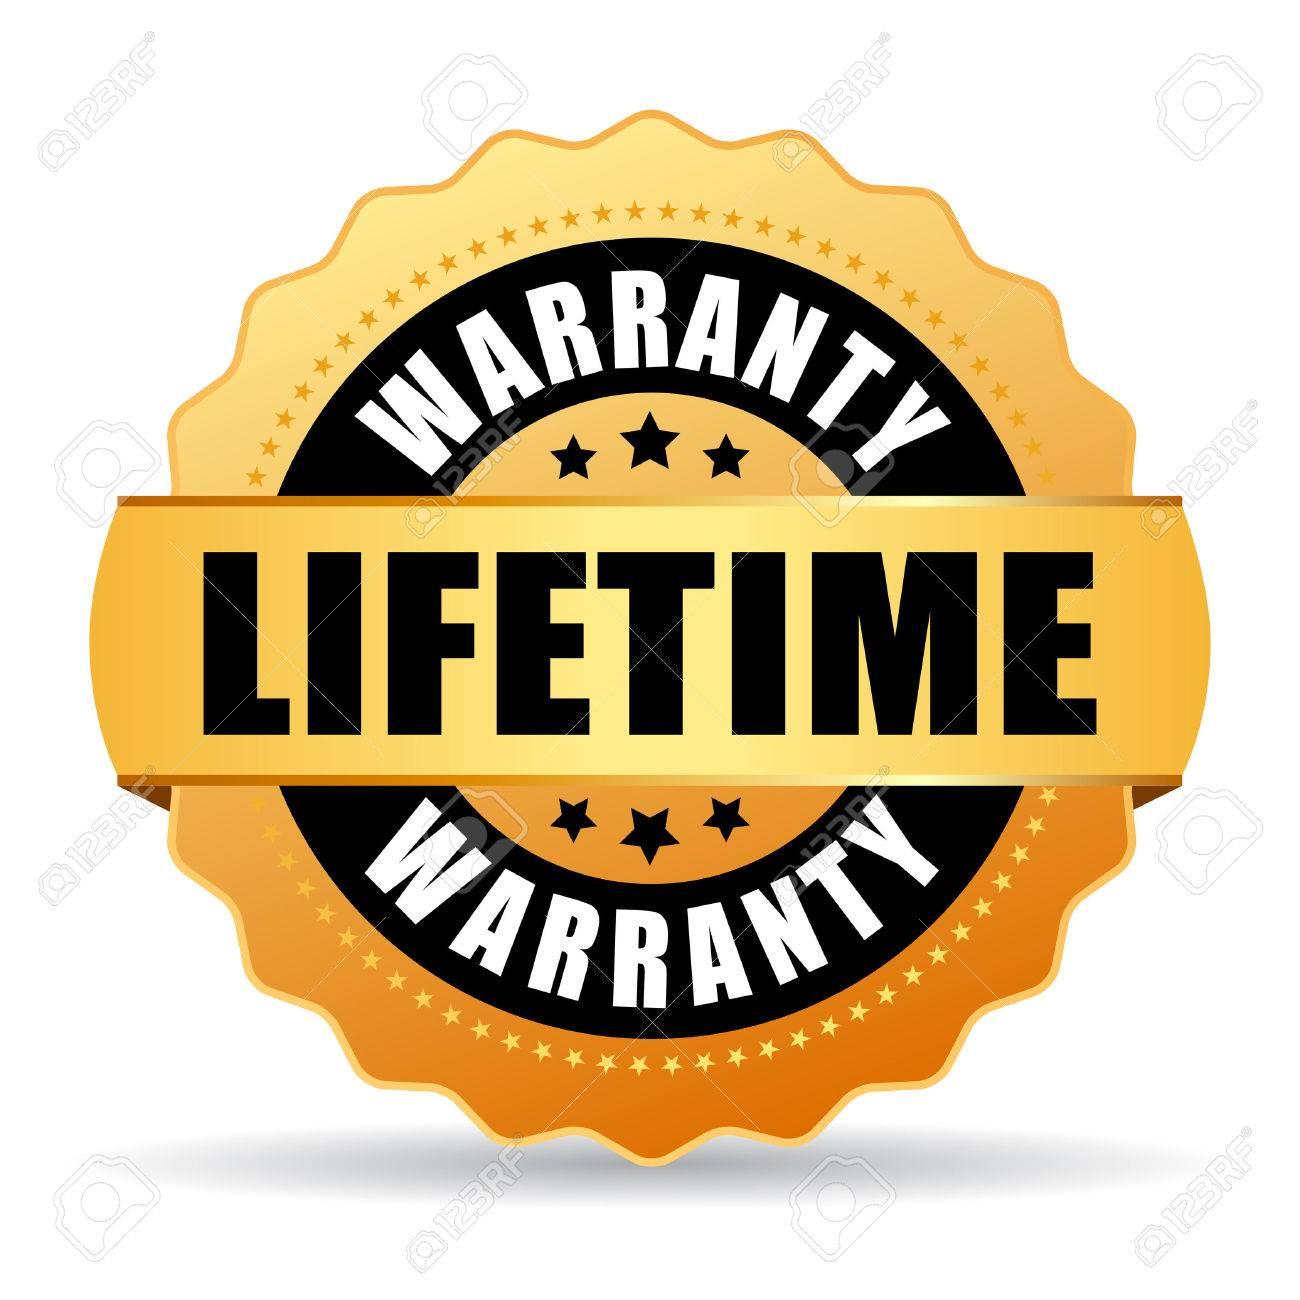 ESC lifetime warranty